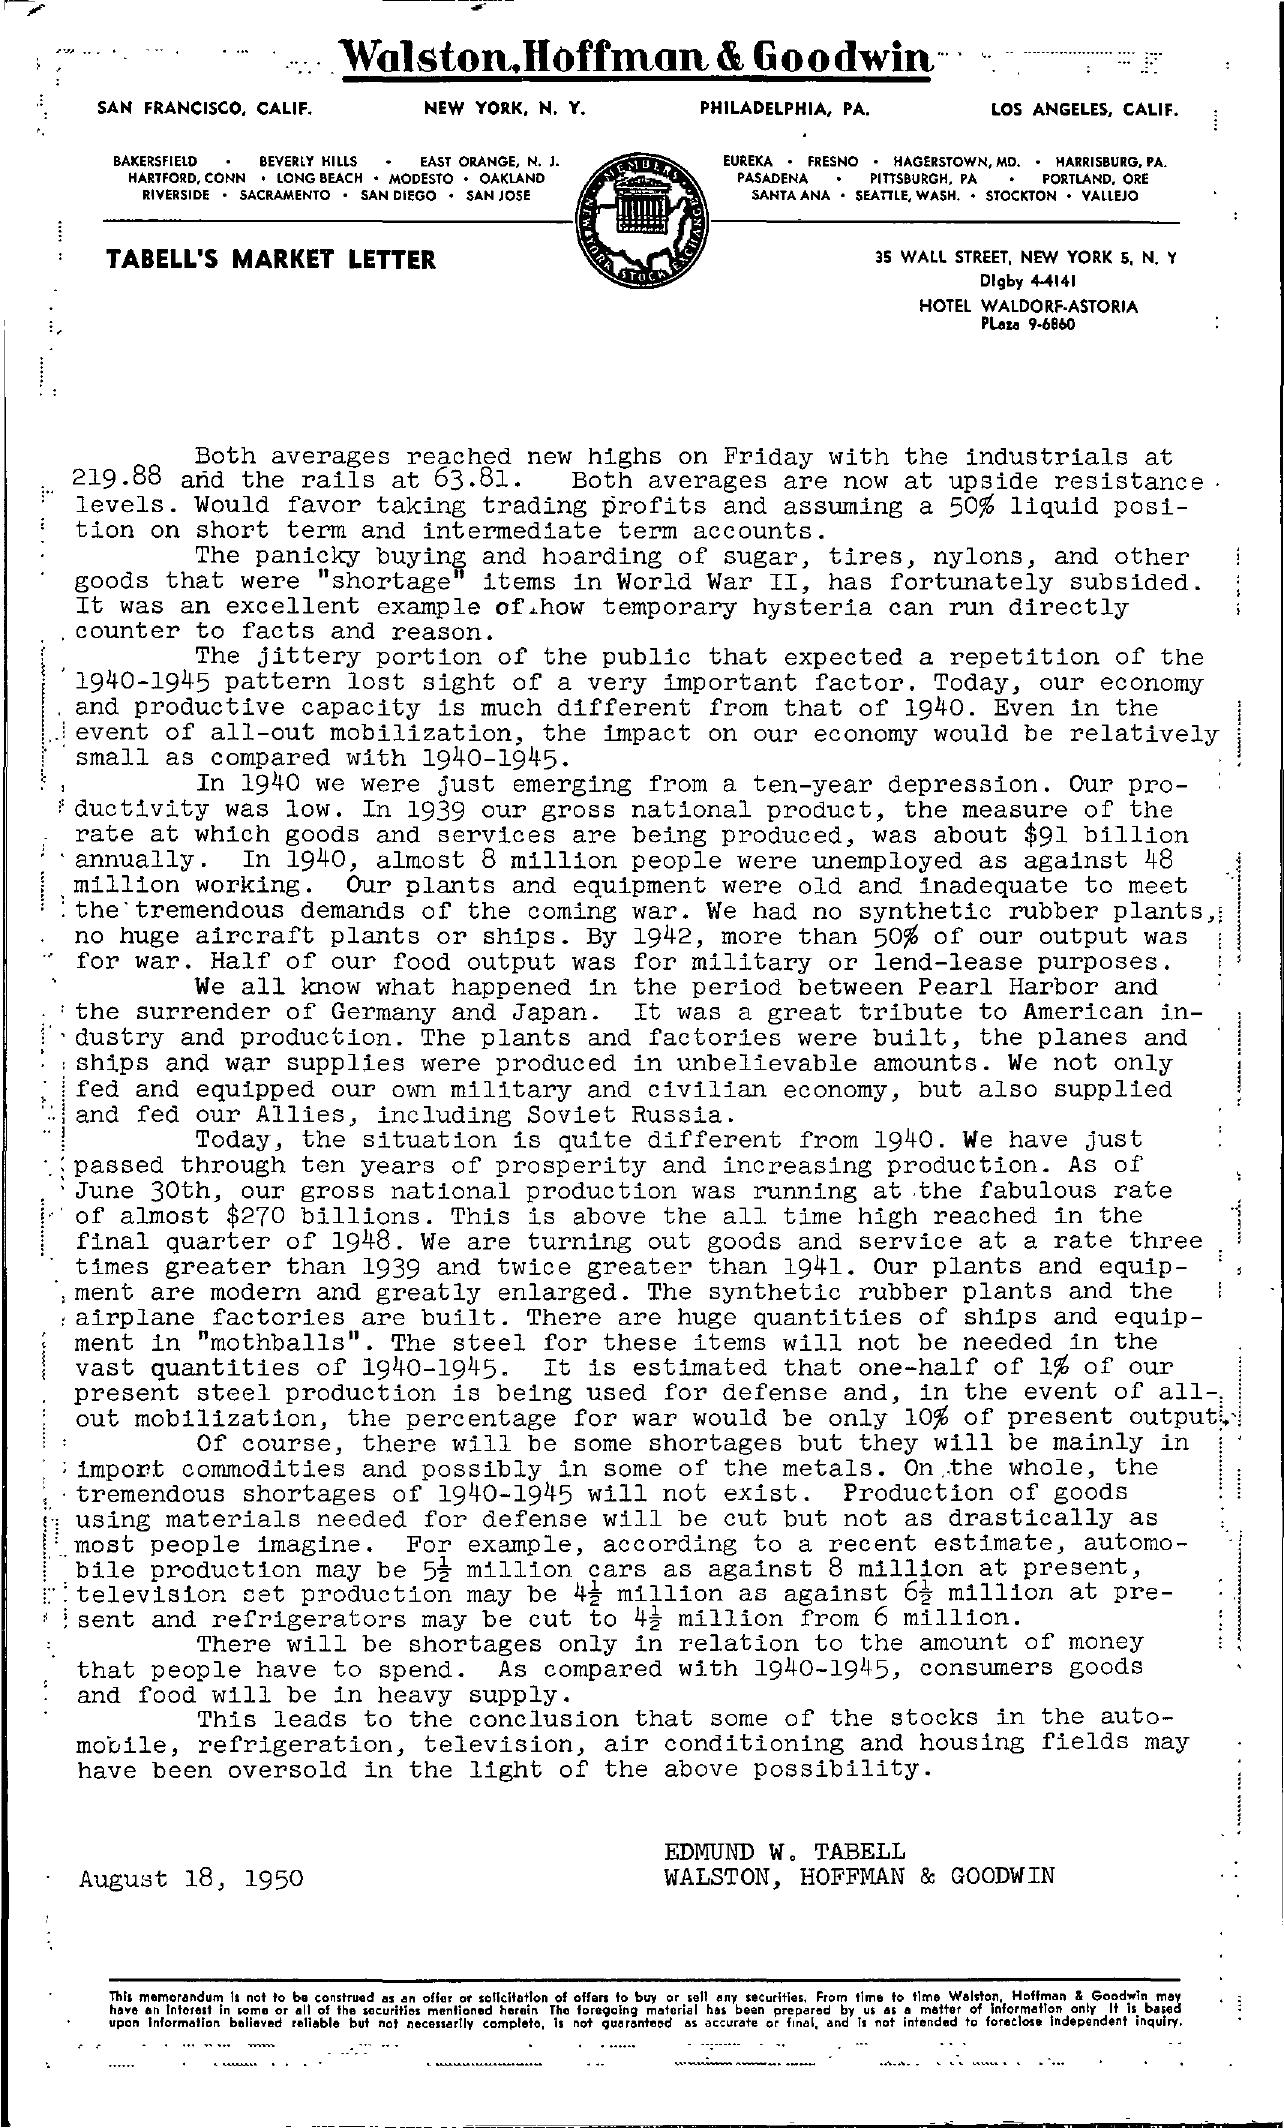 Tabell's Market Letter - August 18, 1950